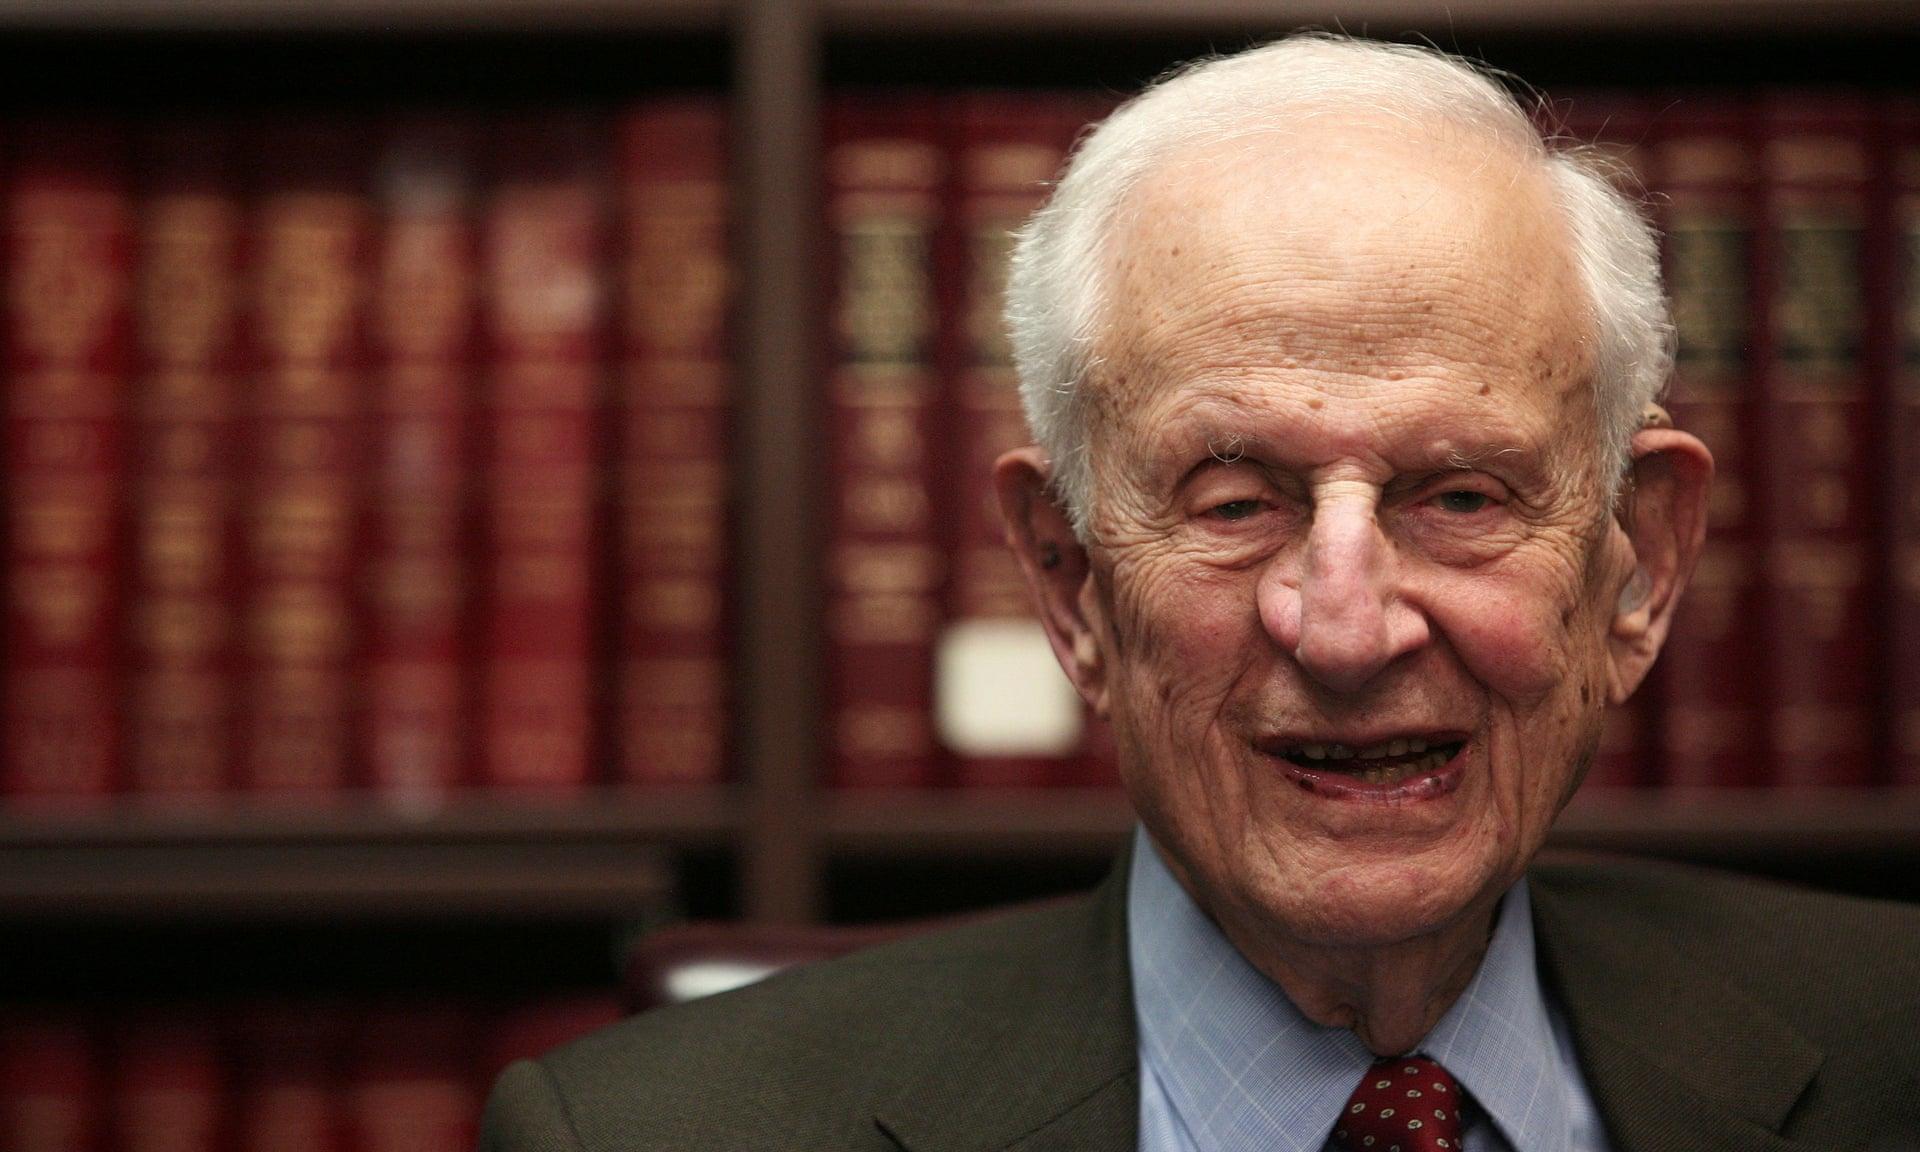 Robert Morgenthau dies at 99